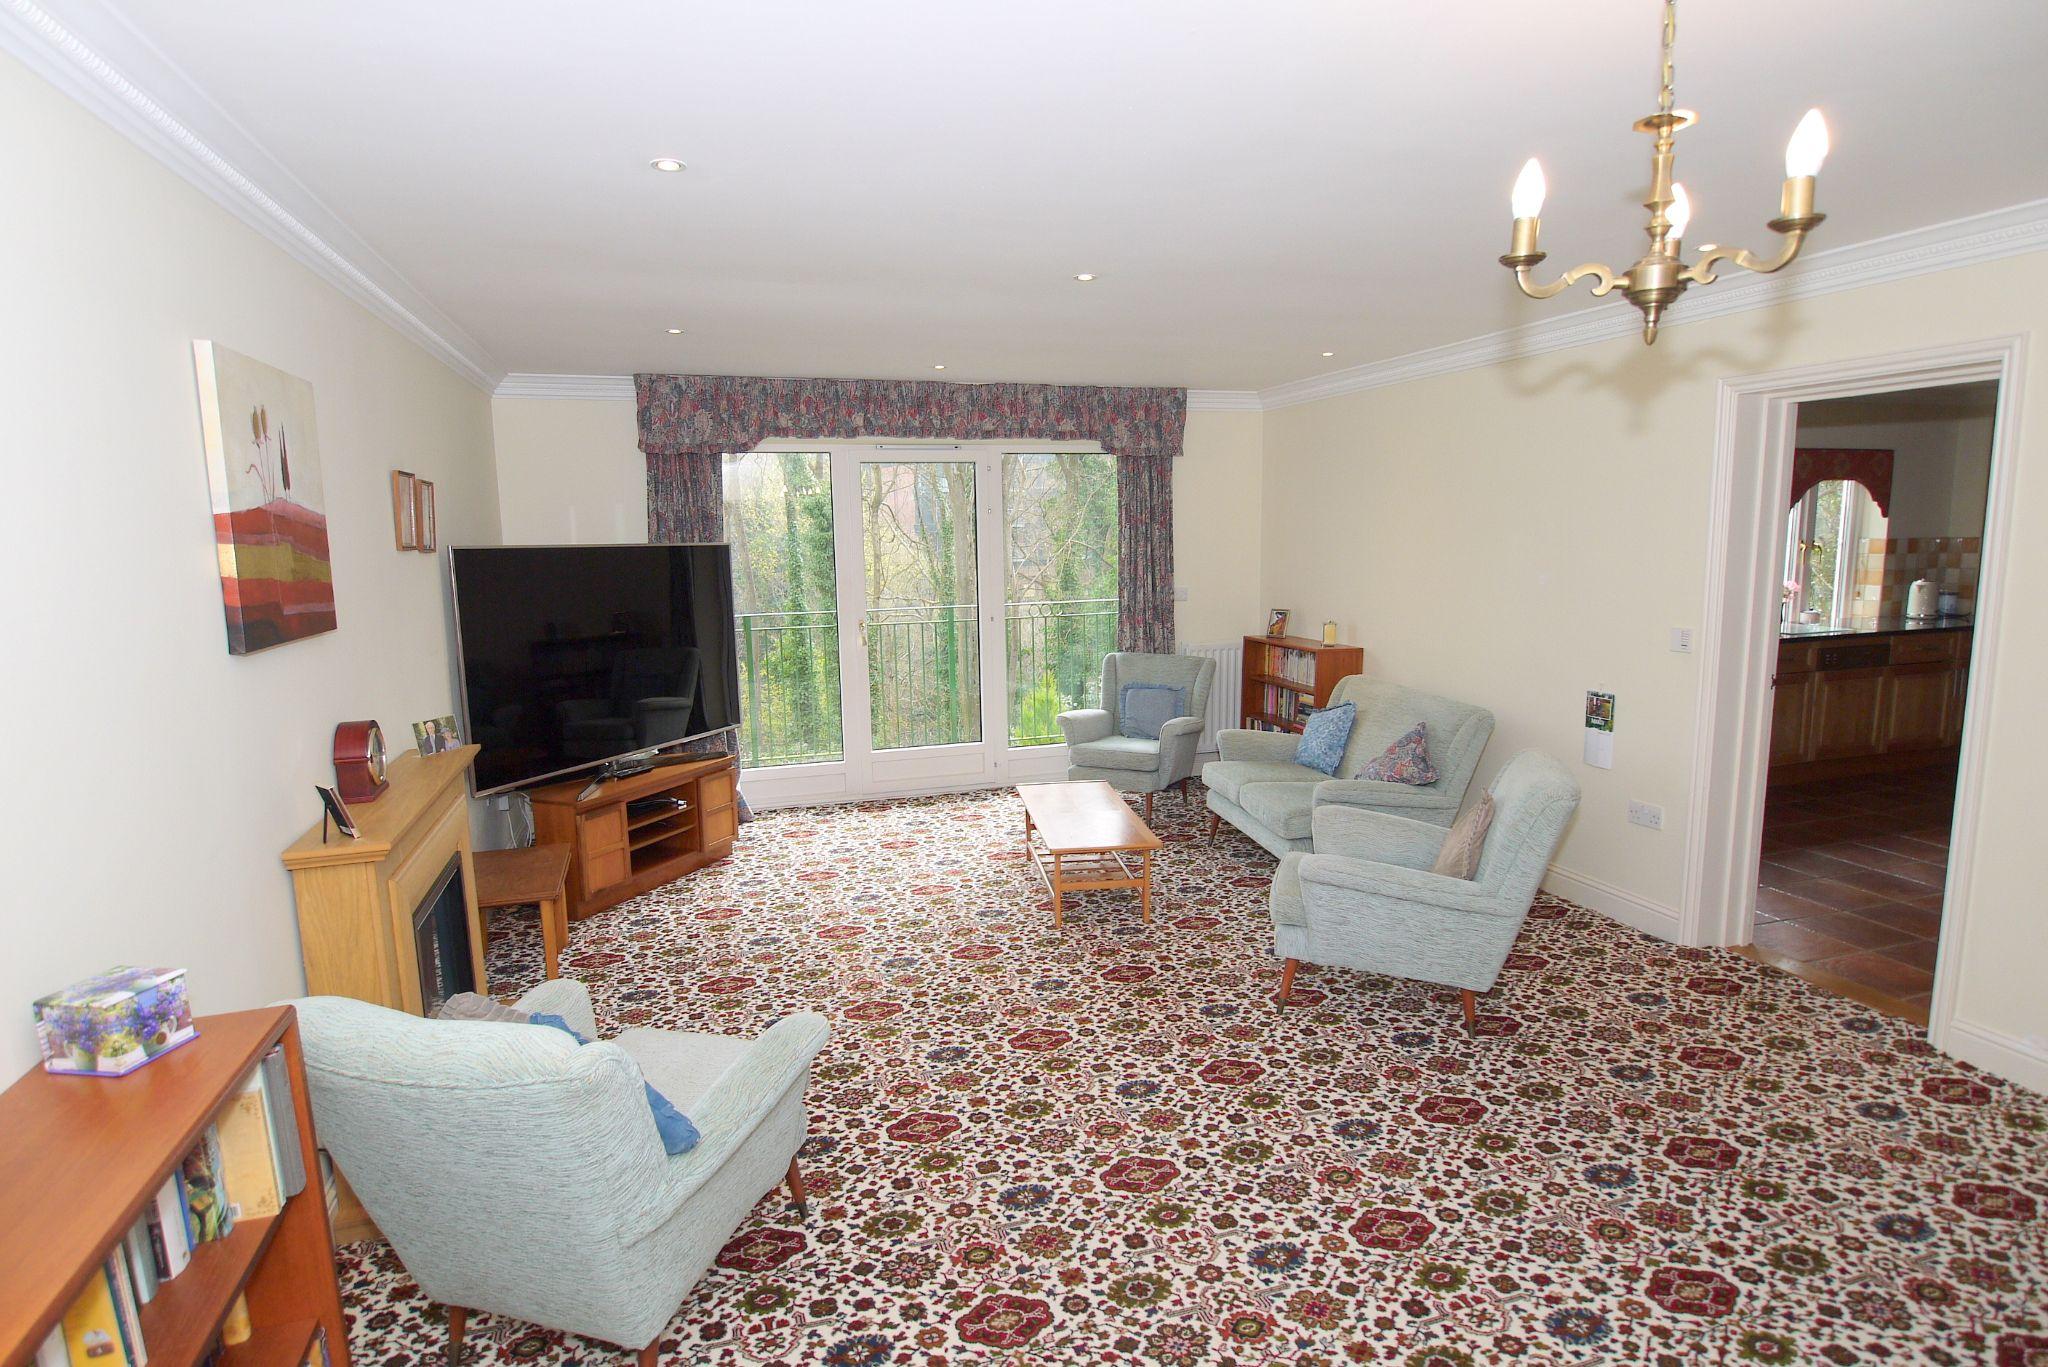 2 bedroom ground floor For Sale in Sevenoaks - Photograph 3